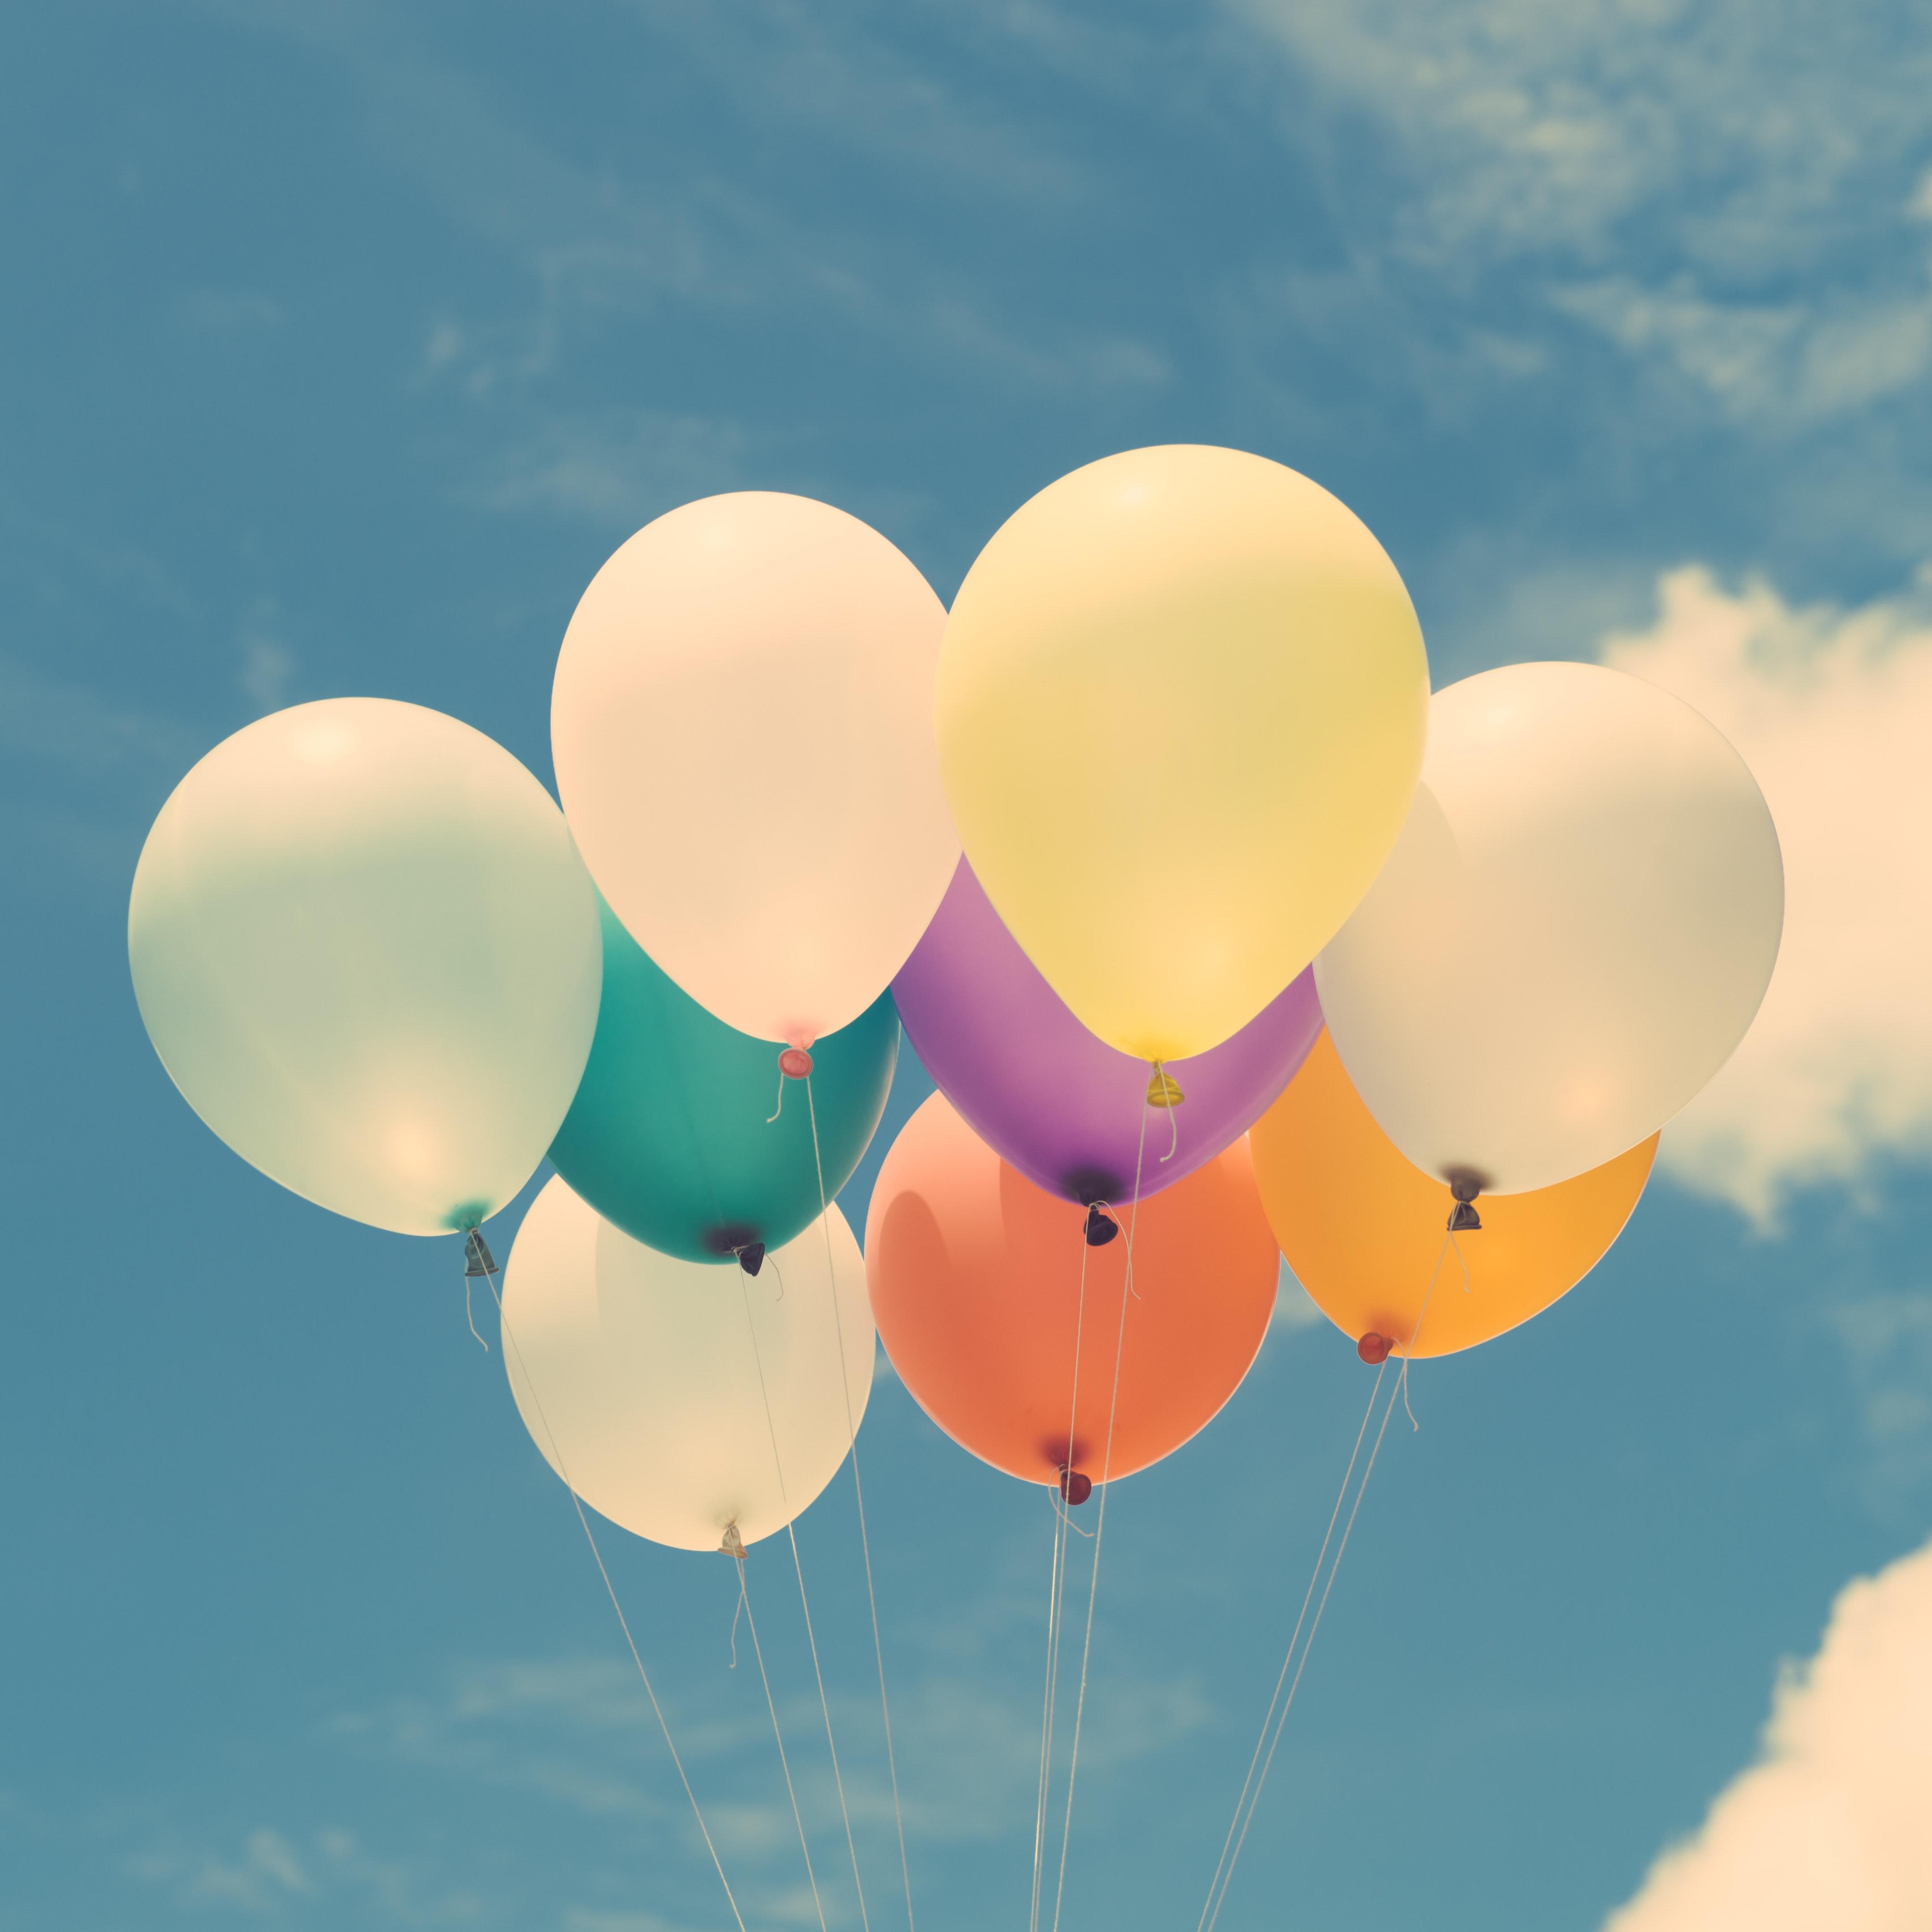 balloons-calm-clouds-574282